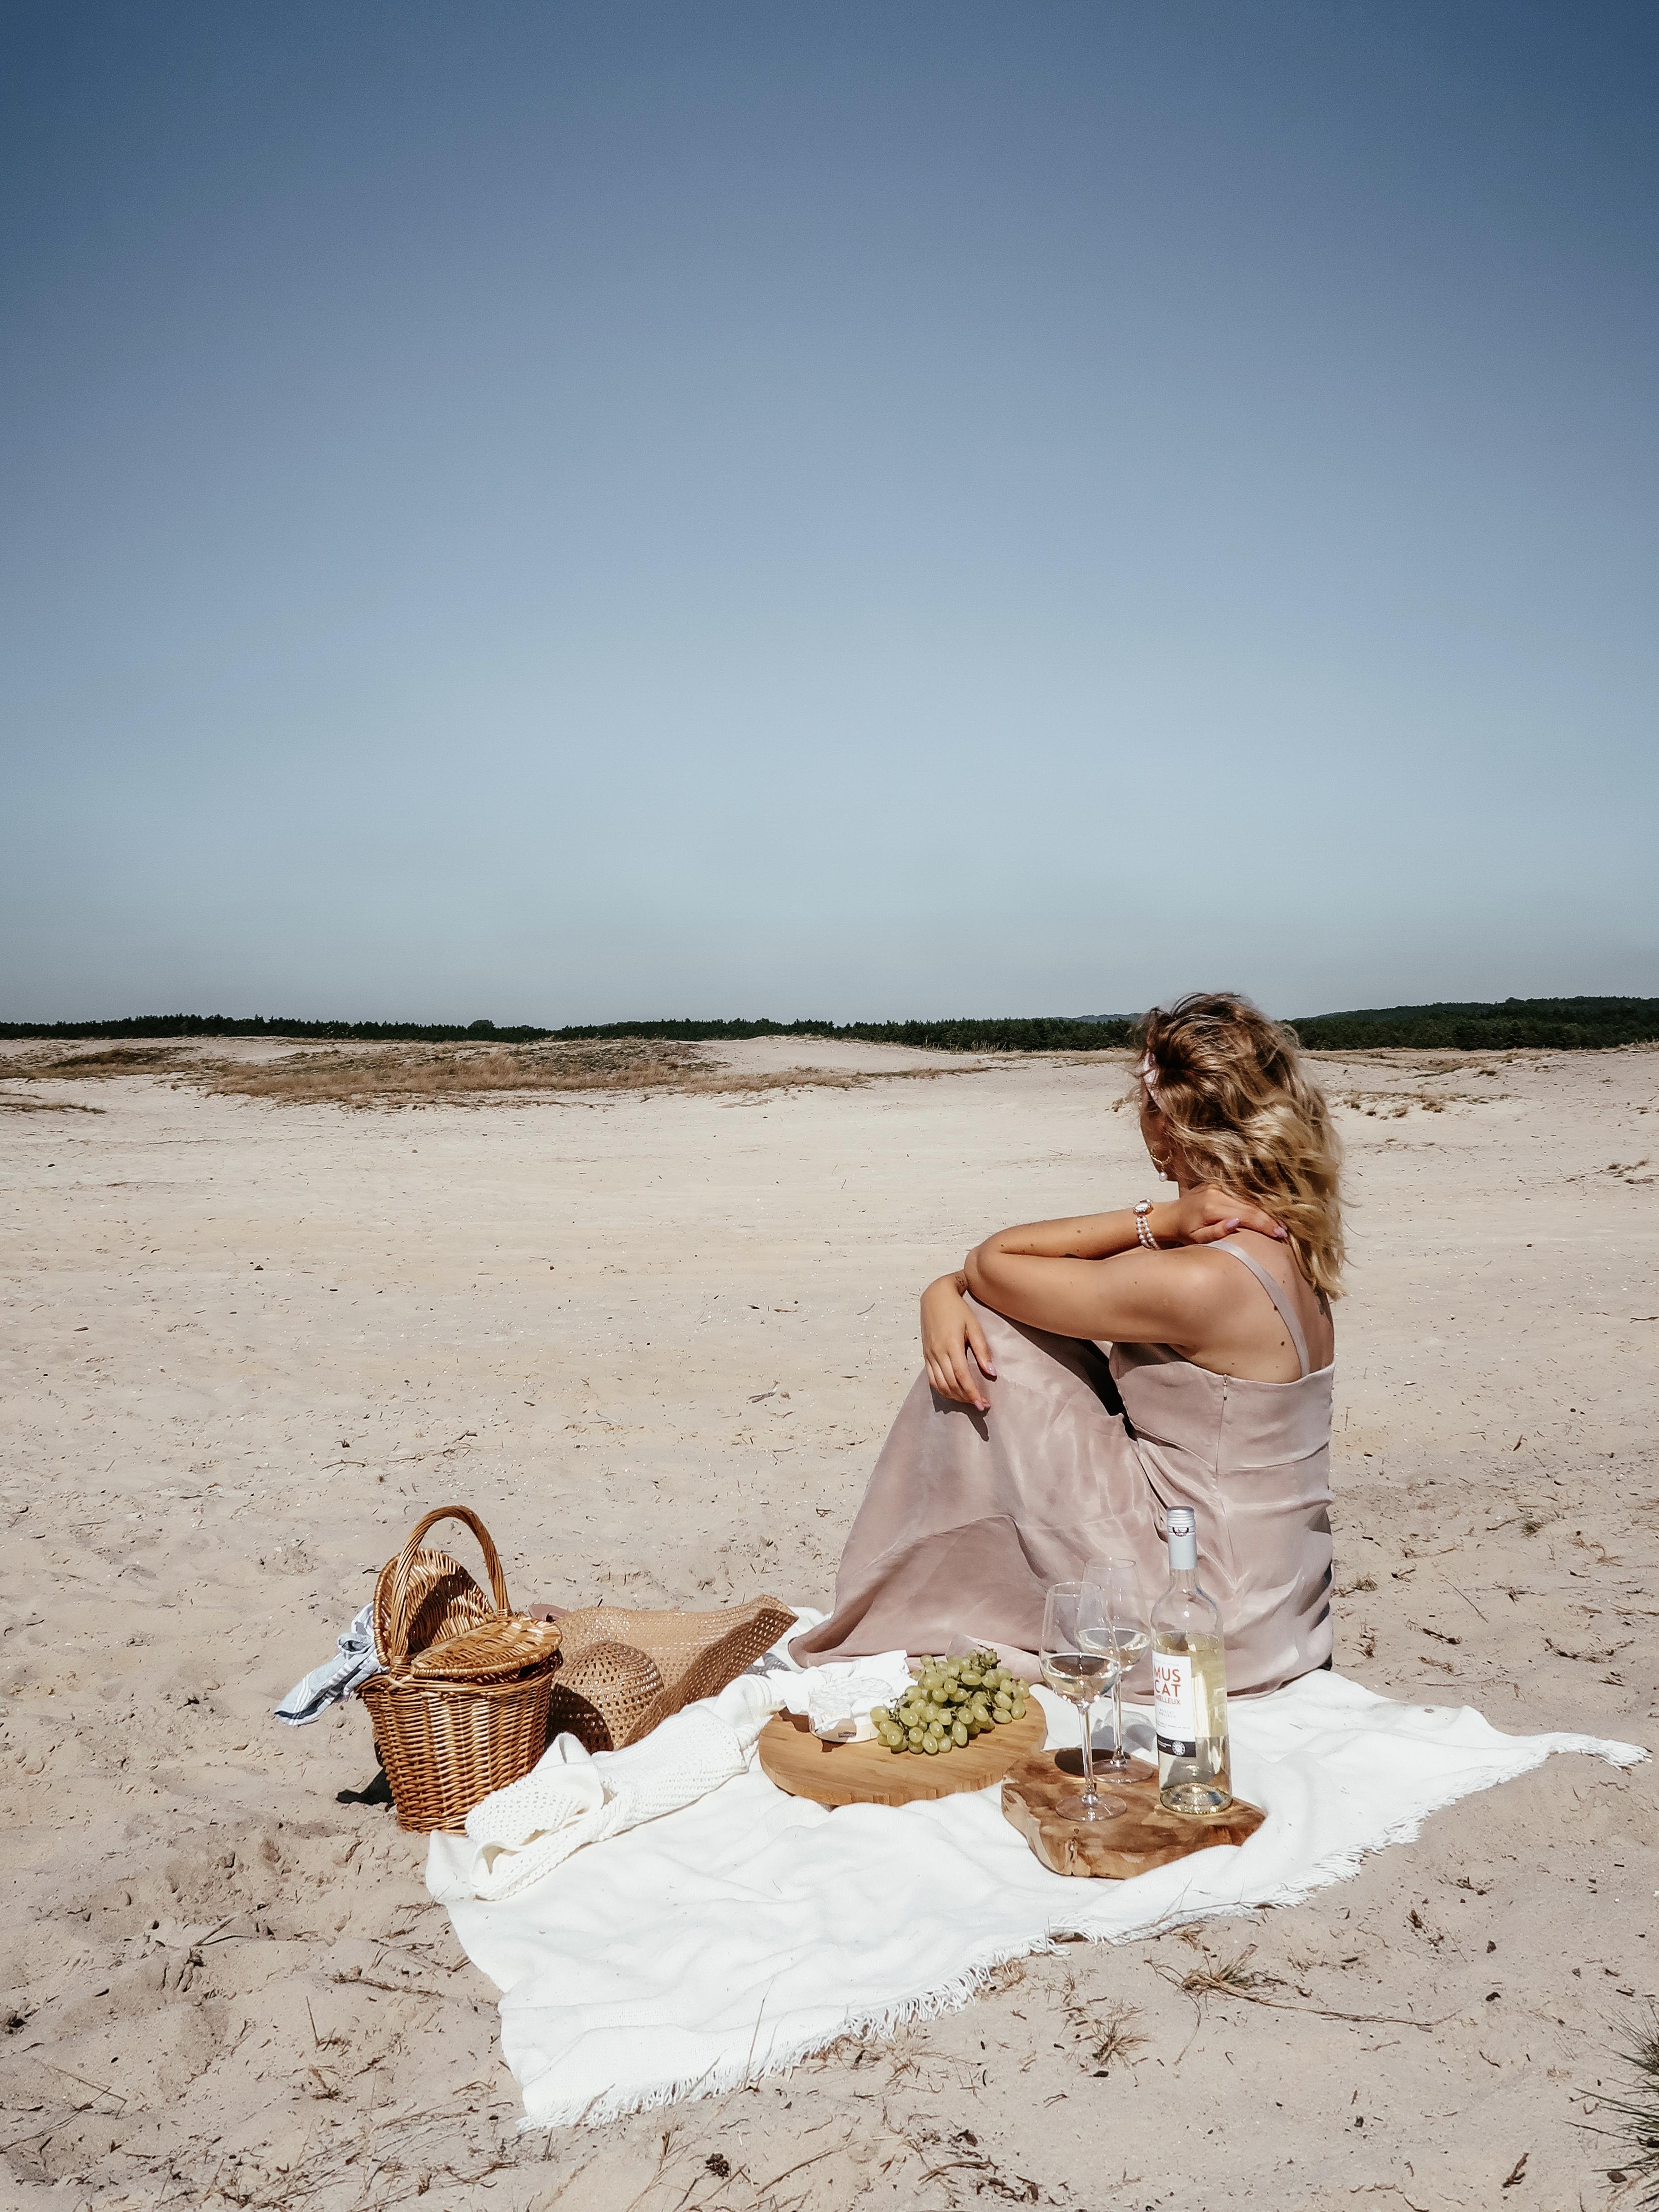 Piknik pośrodku pustyni // ootd